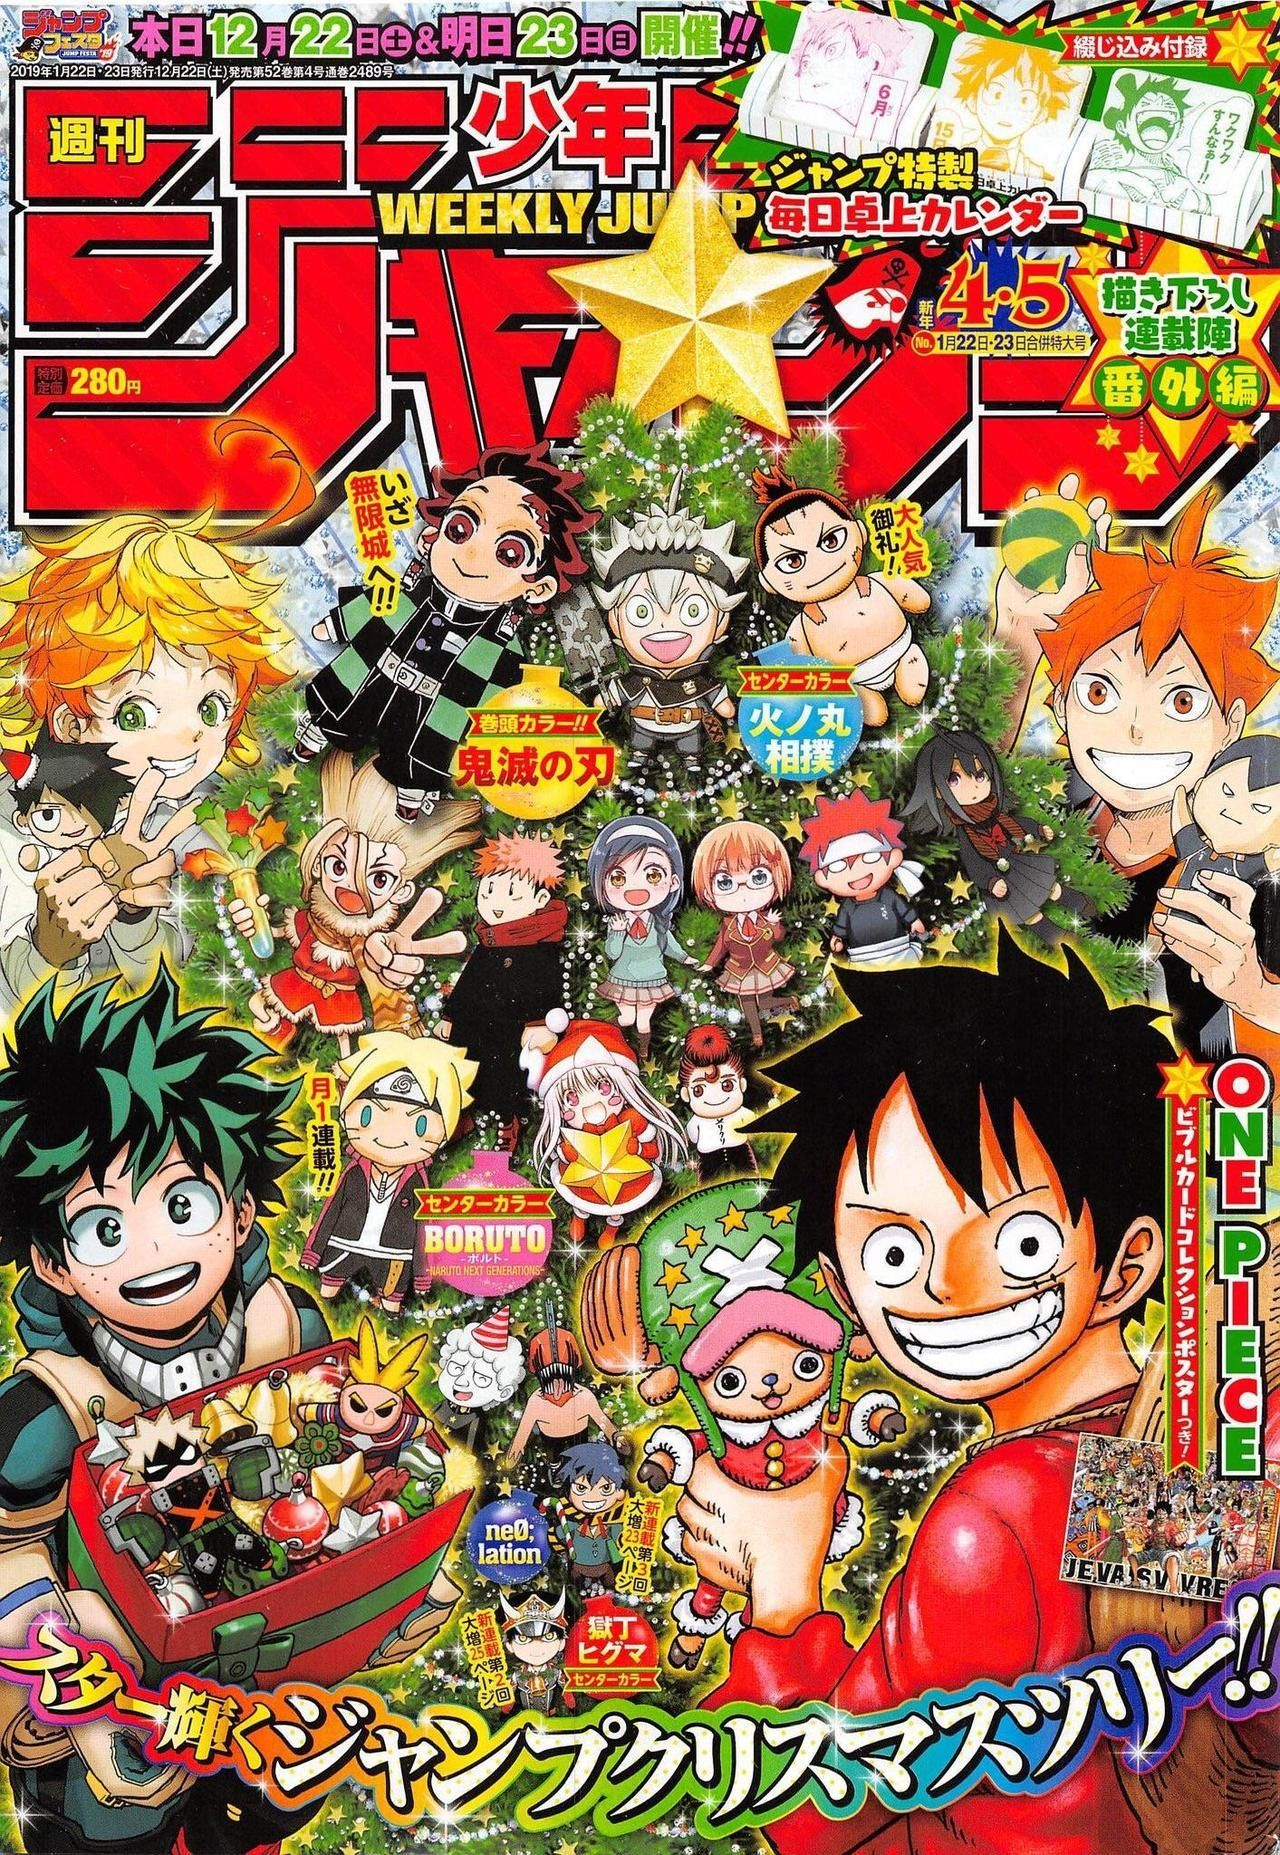 Weekly Shonen Jump 2019 issue | Manga, One piece manga y